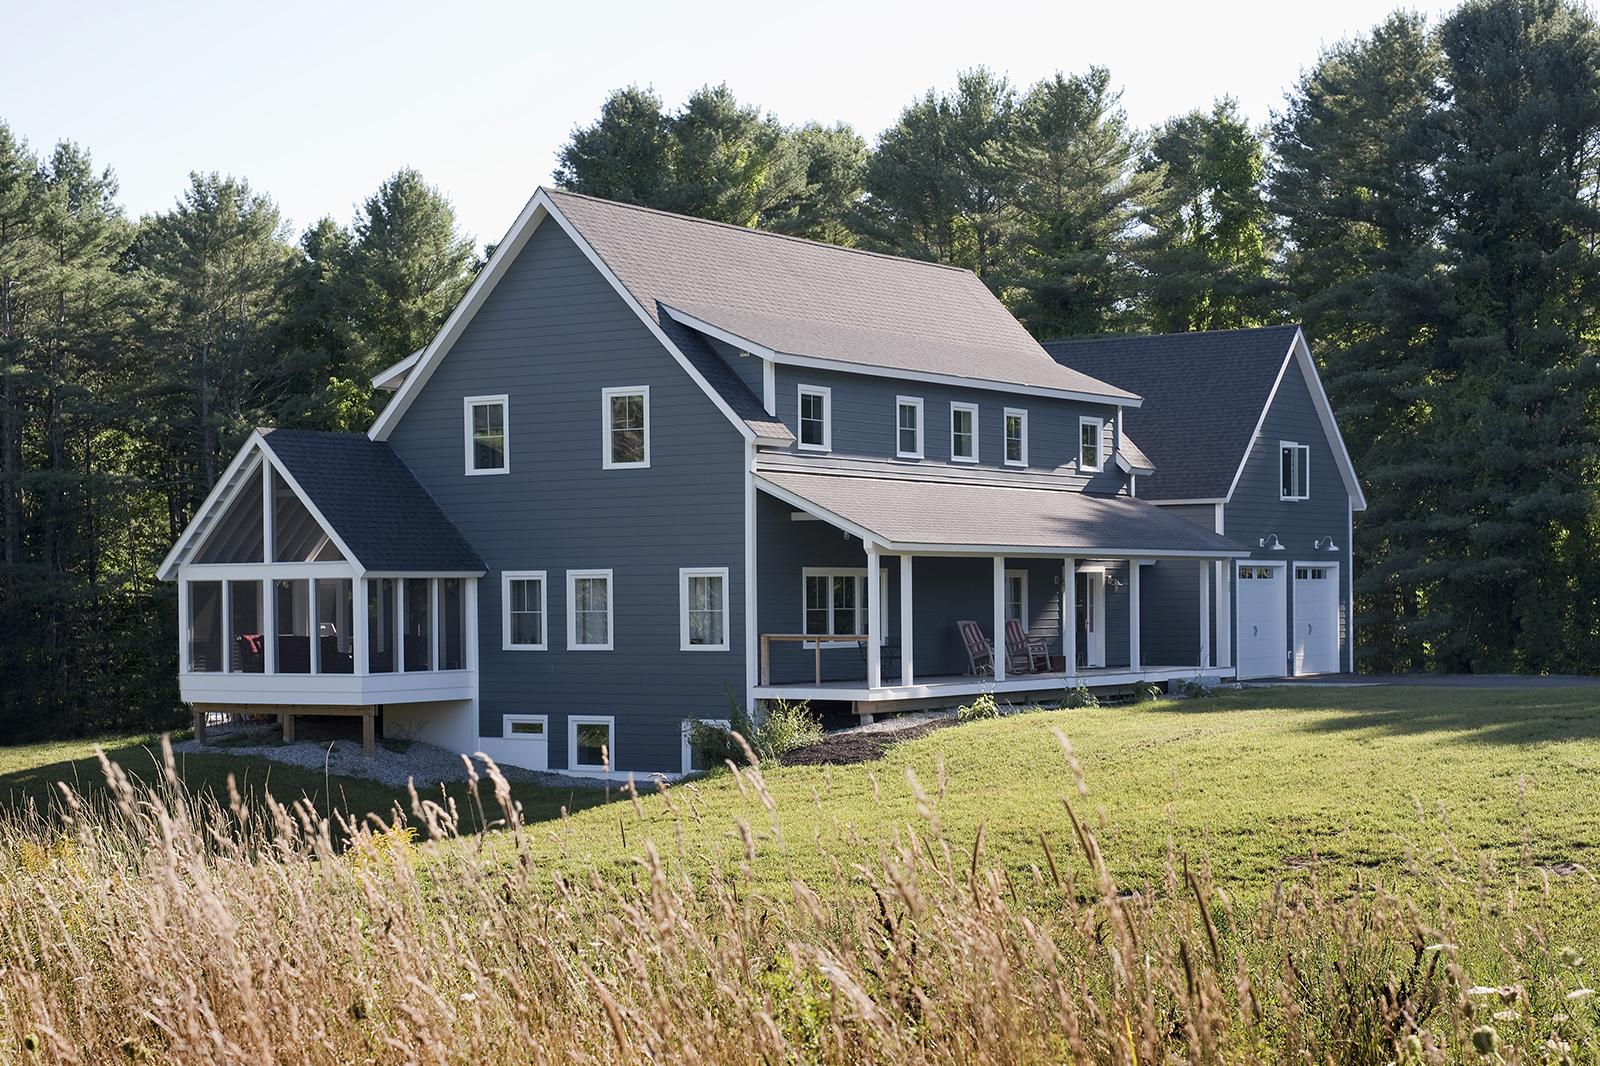 net zero home design. Living the Net Zero House Dream  EcoBuilding Pulse Magazine Energy Efficiency Efficient Construction Design